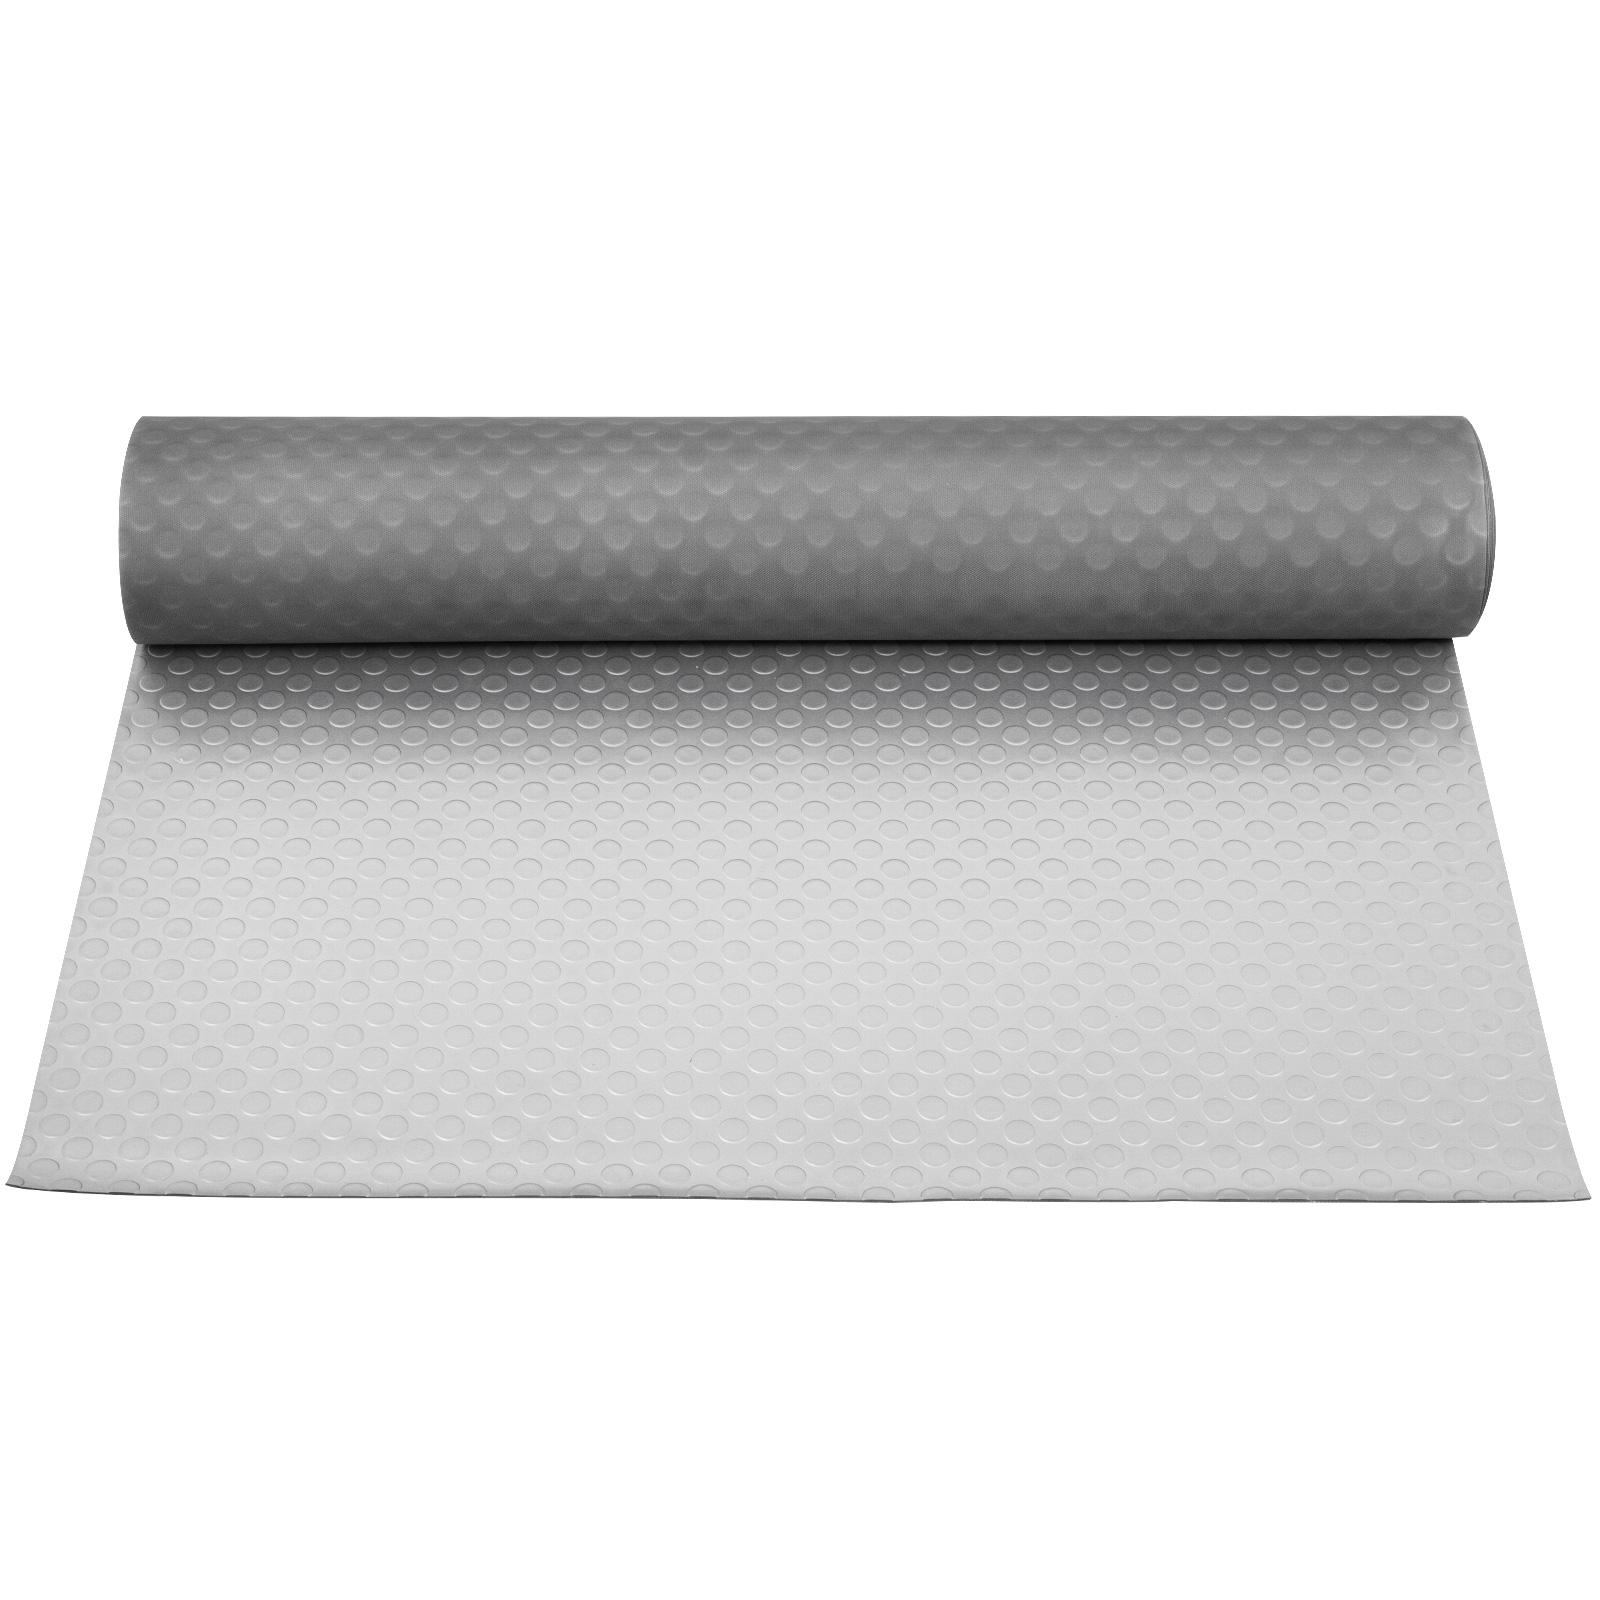 thumbnail 144 - Garage Flooring Mat Roll Car Trailer Floor Covering 1.1m Width Gym Floor Roll